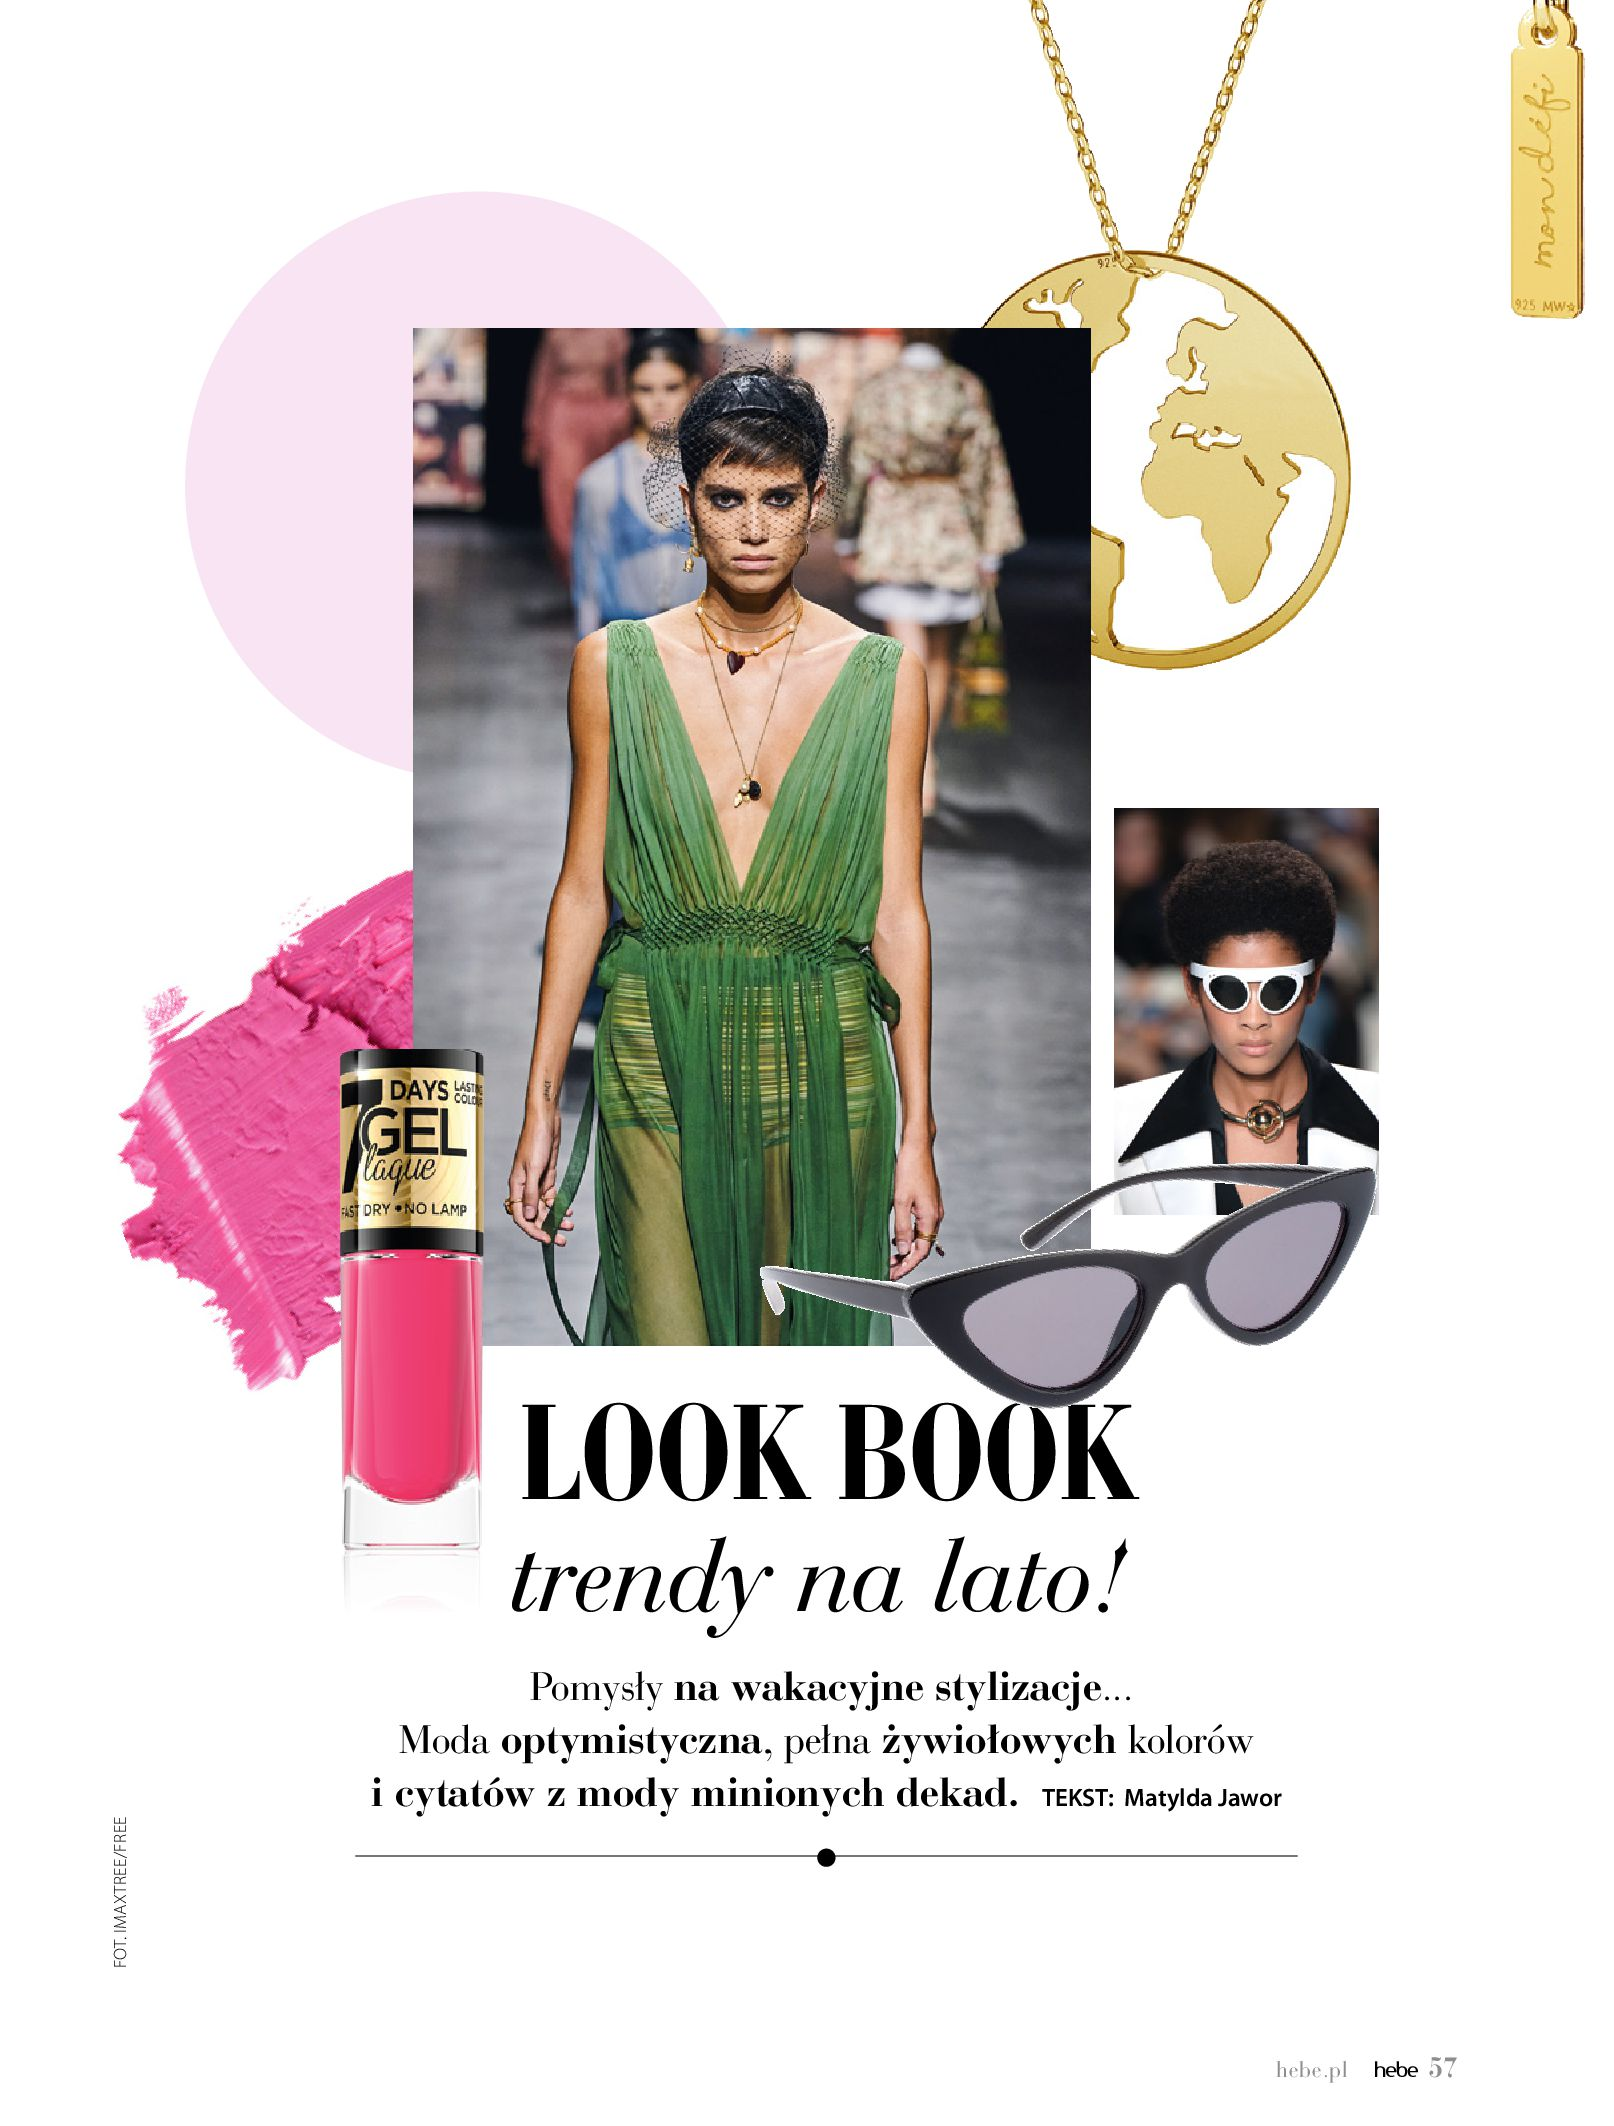 Gazetka hebe: Magazyn Hebe - Trendy na lato 2021-07-01 page-57